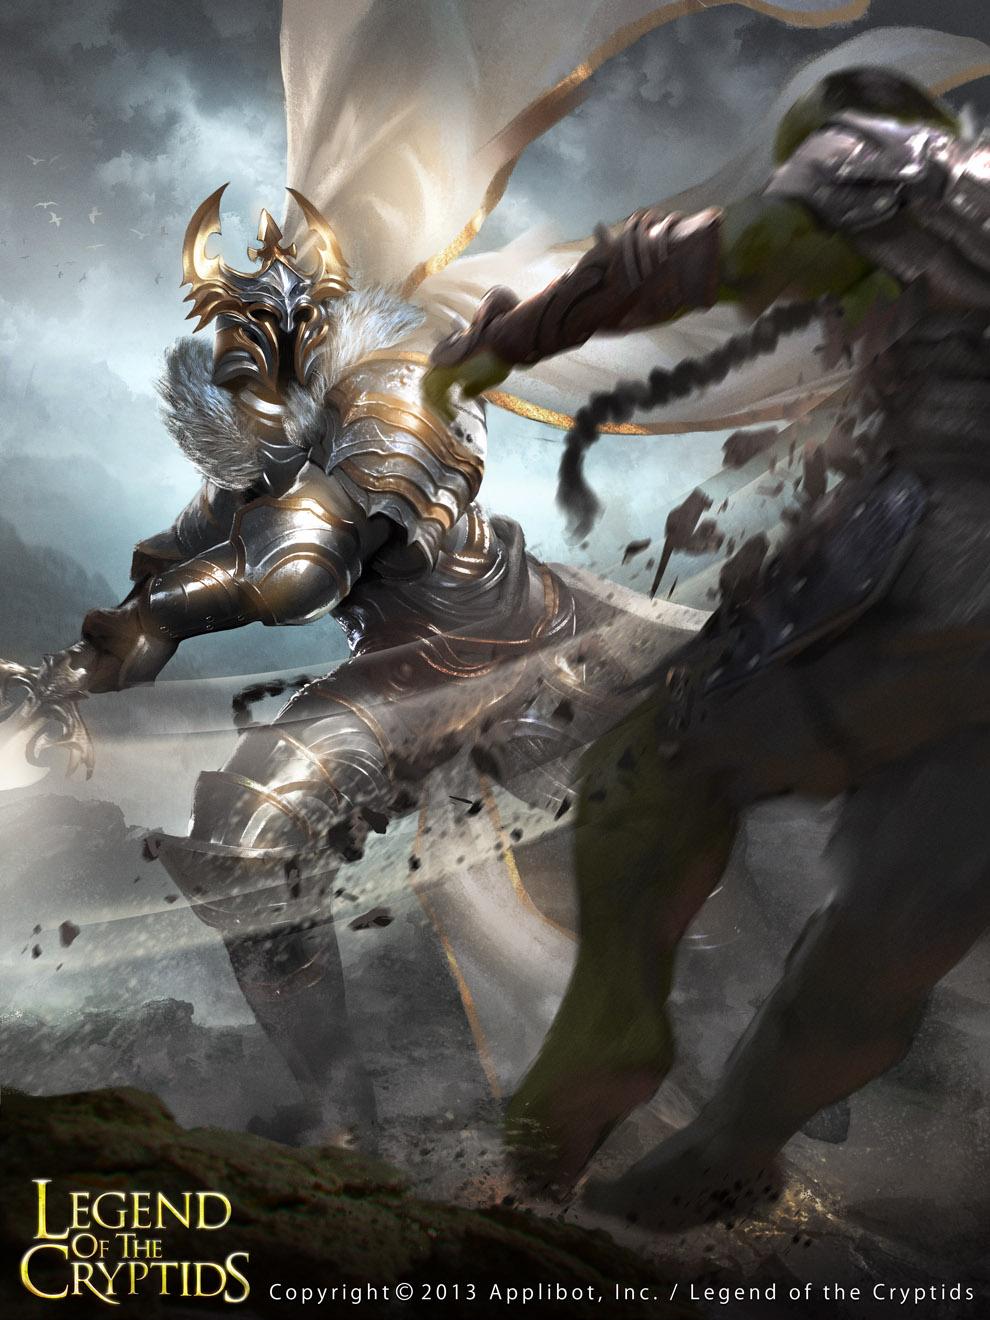 White Knight by LASAHIDO on DeviantArt